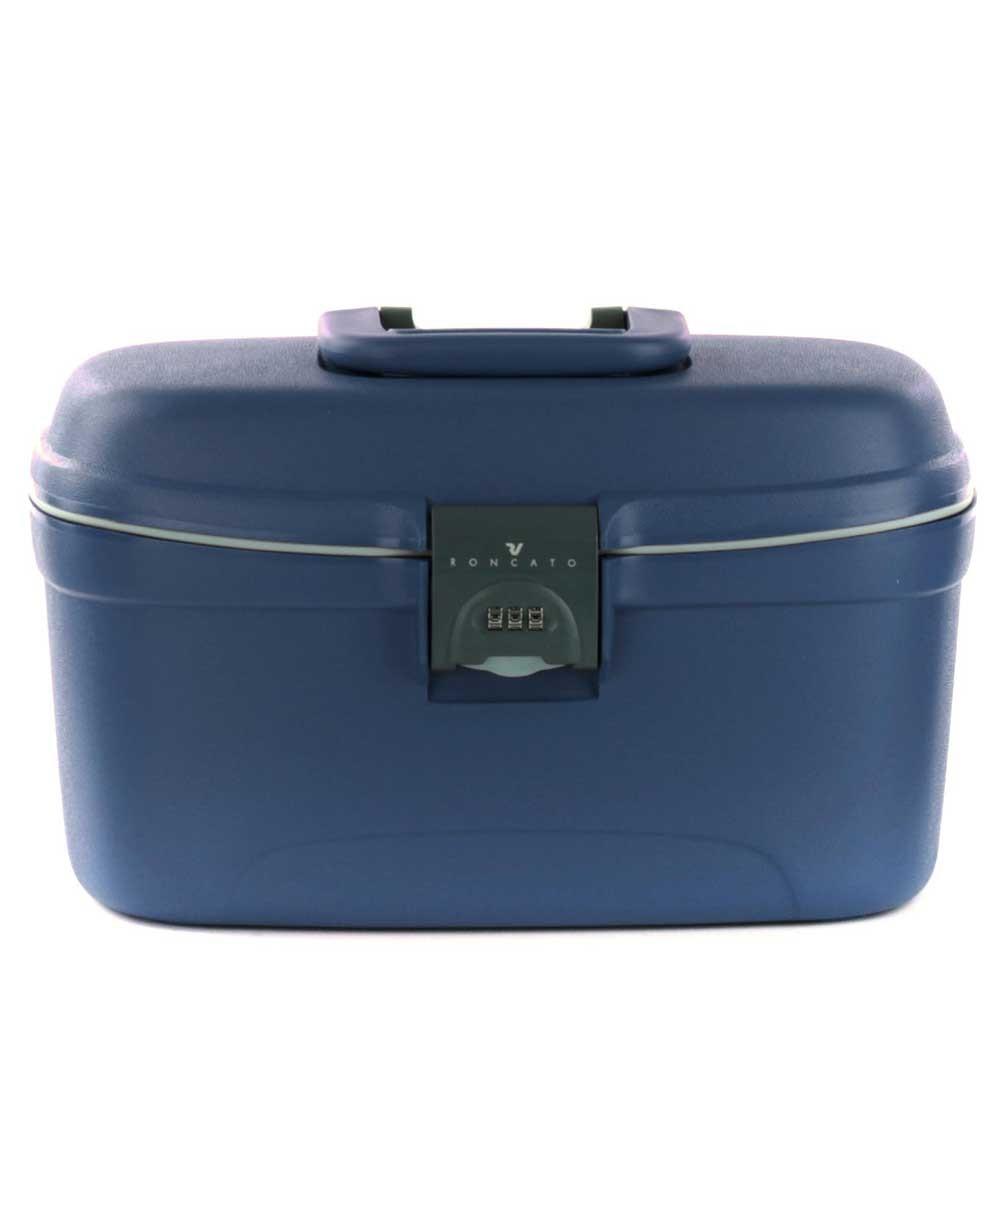 Roncato Light Neceser Azul Marino (Foto )